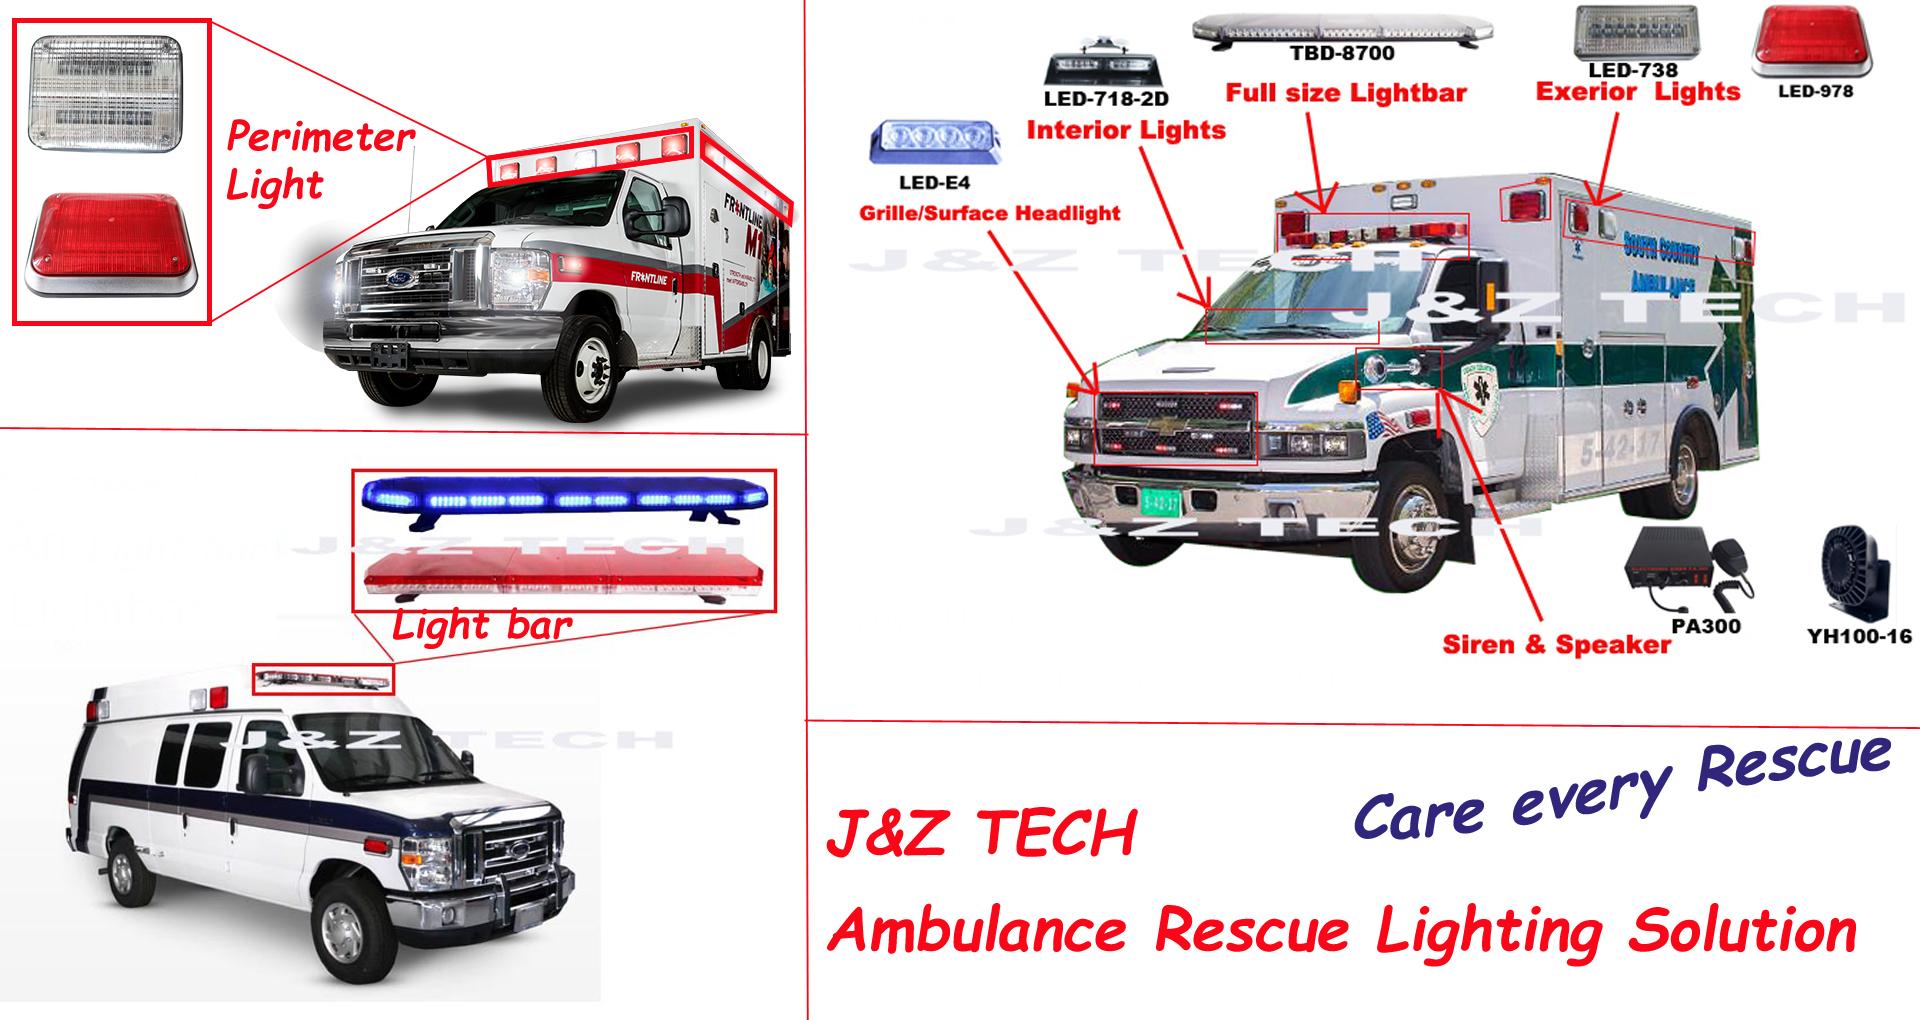 ambulance lighting solutions.jpg